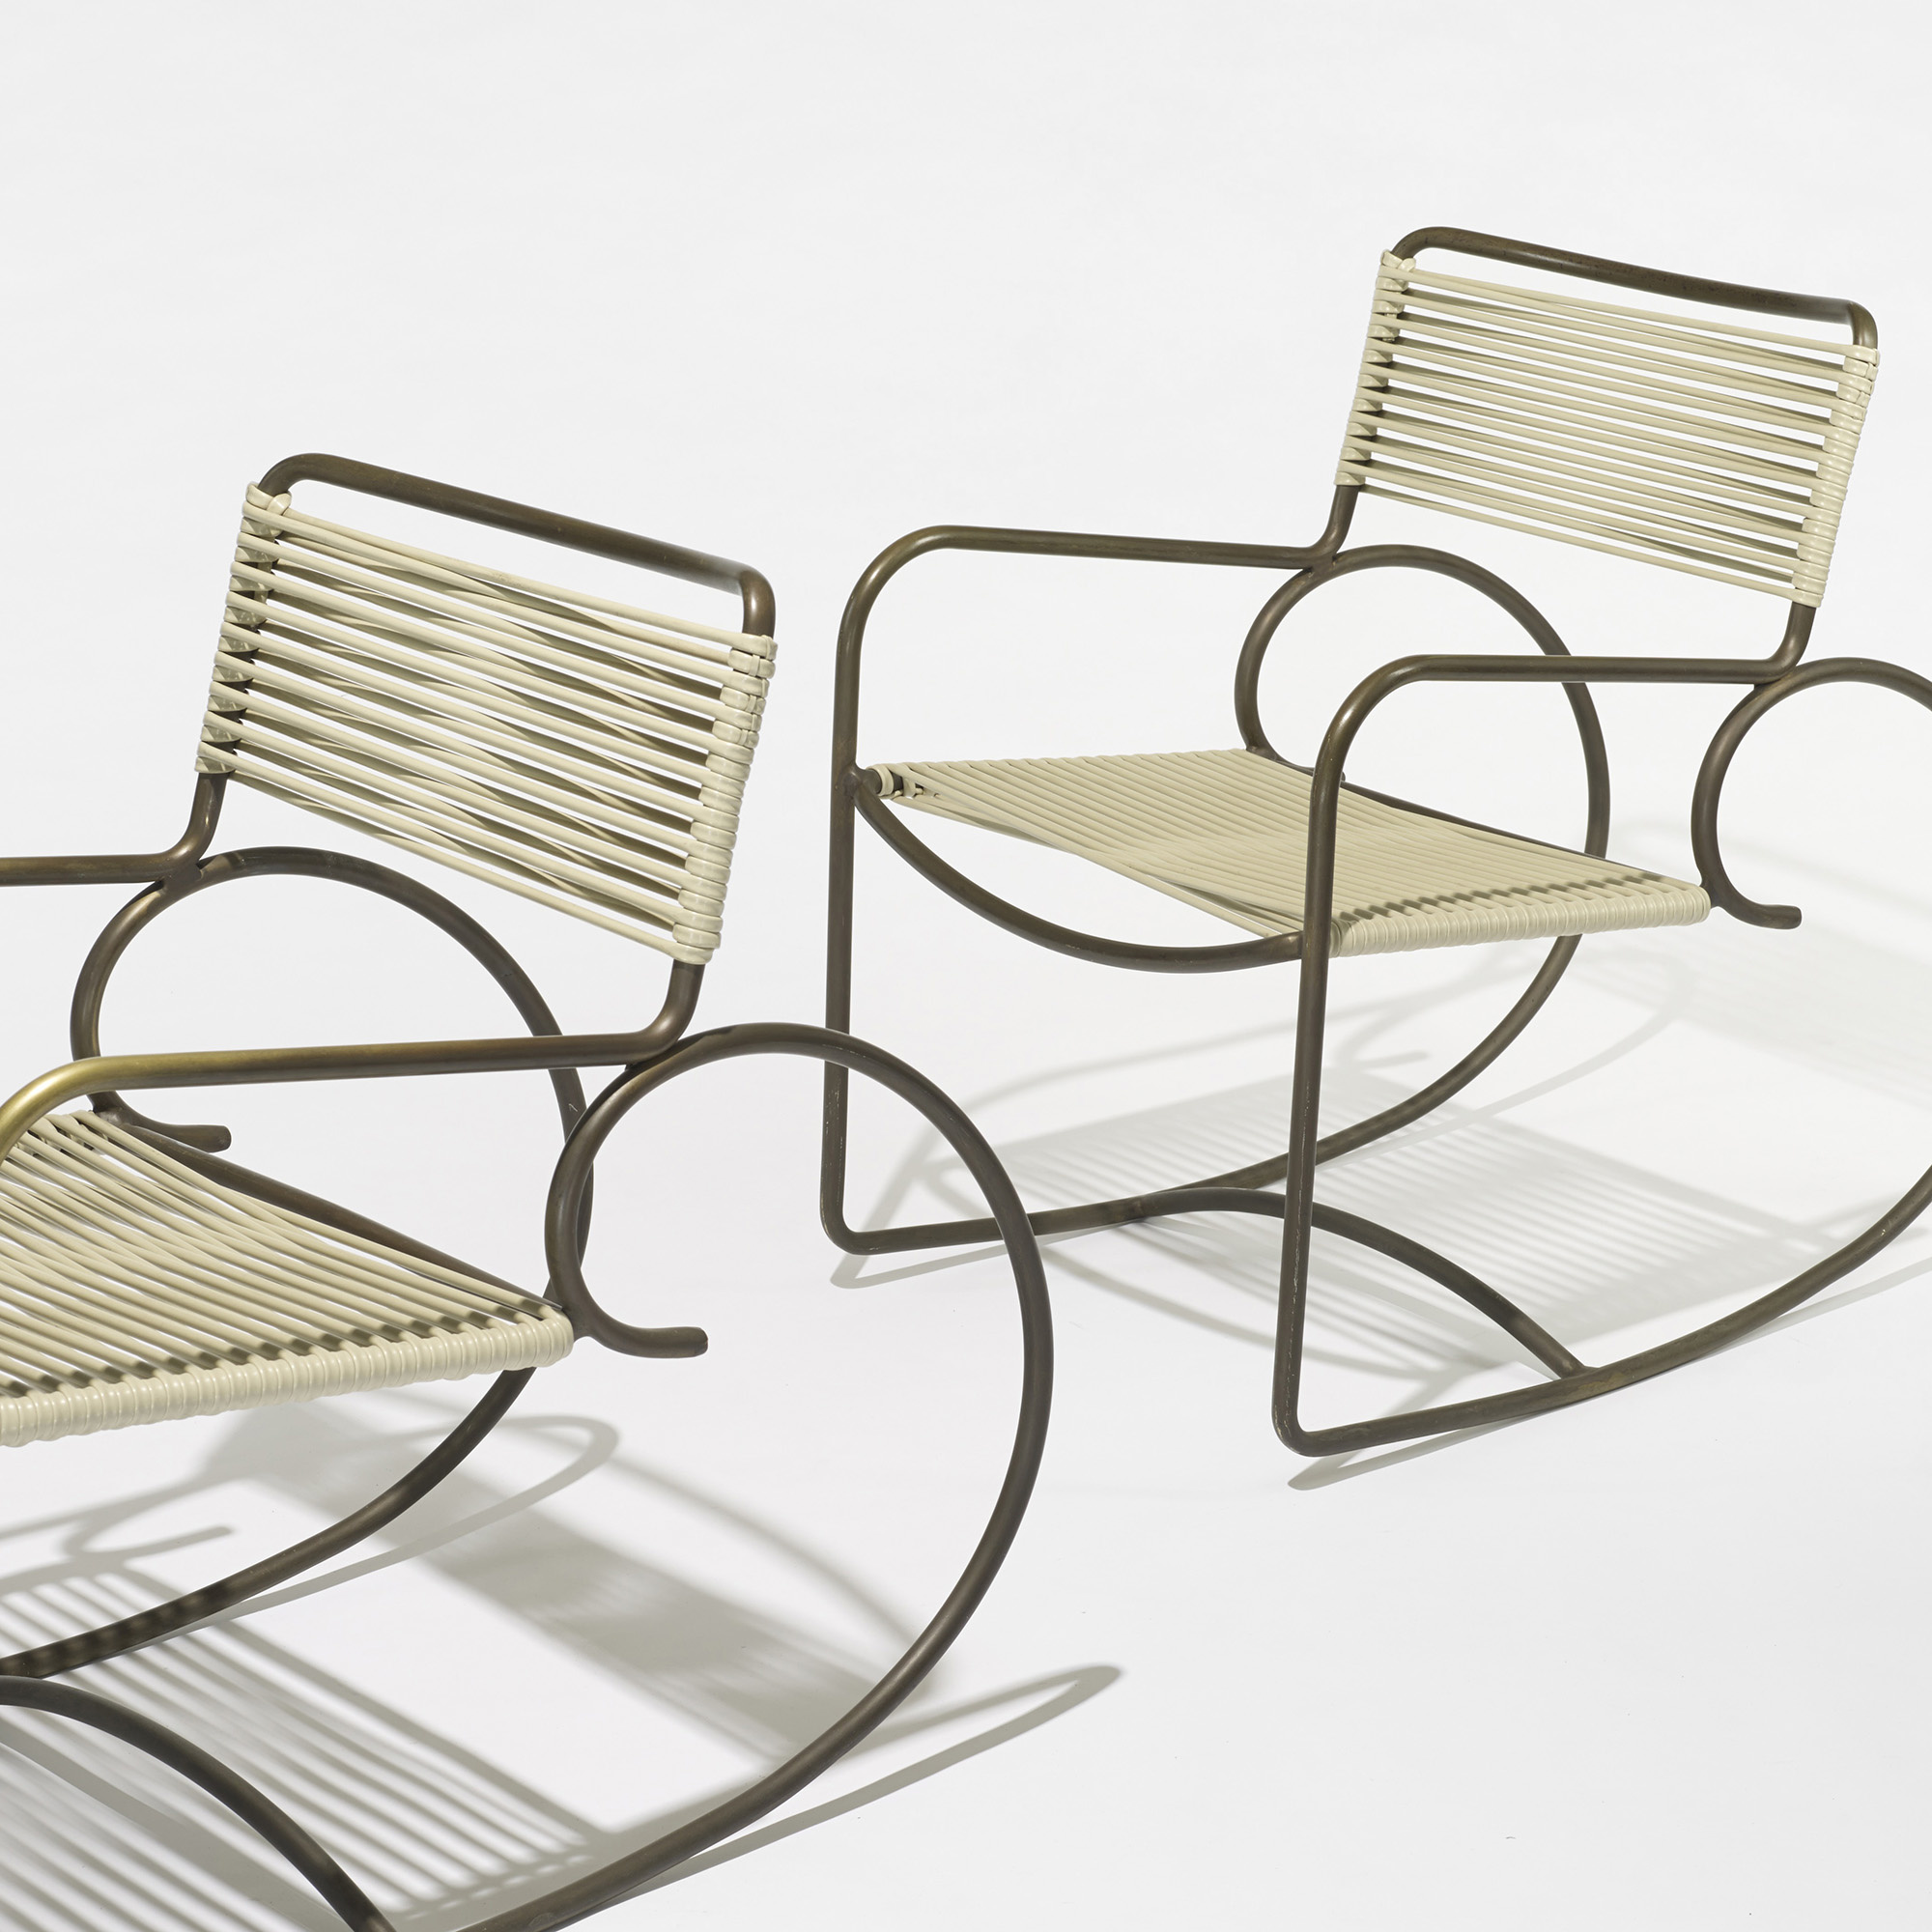 Astonishing 332 Walter Lamb Rocking Chairs Model C 5701 Set Of Three Inzonedesignstudio Interior Chair Design Inzonedesignstudiocom